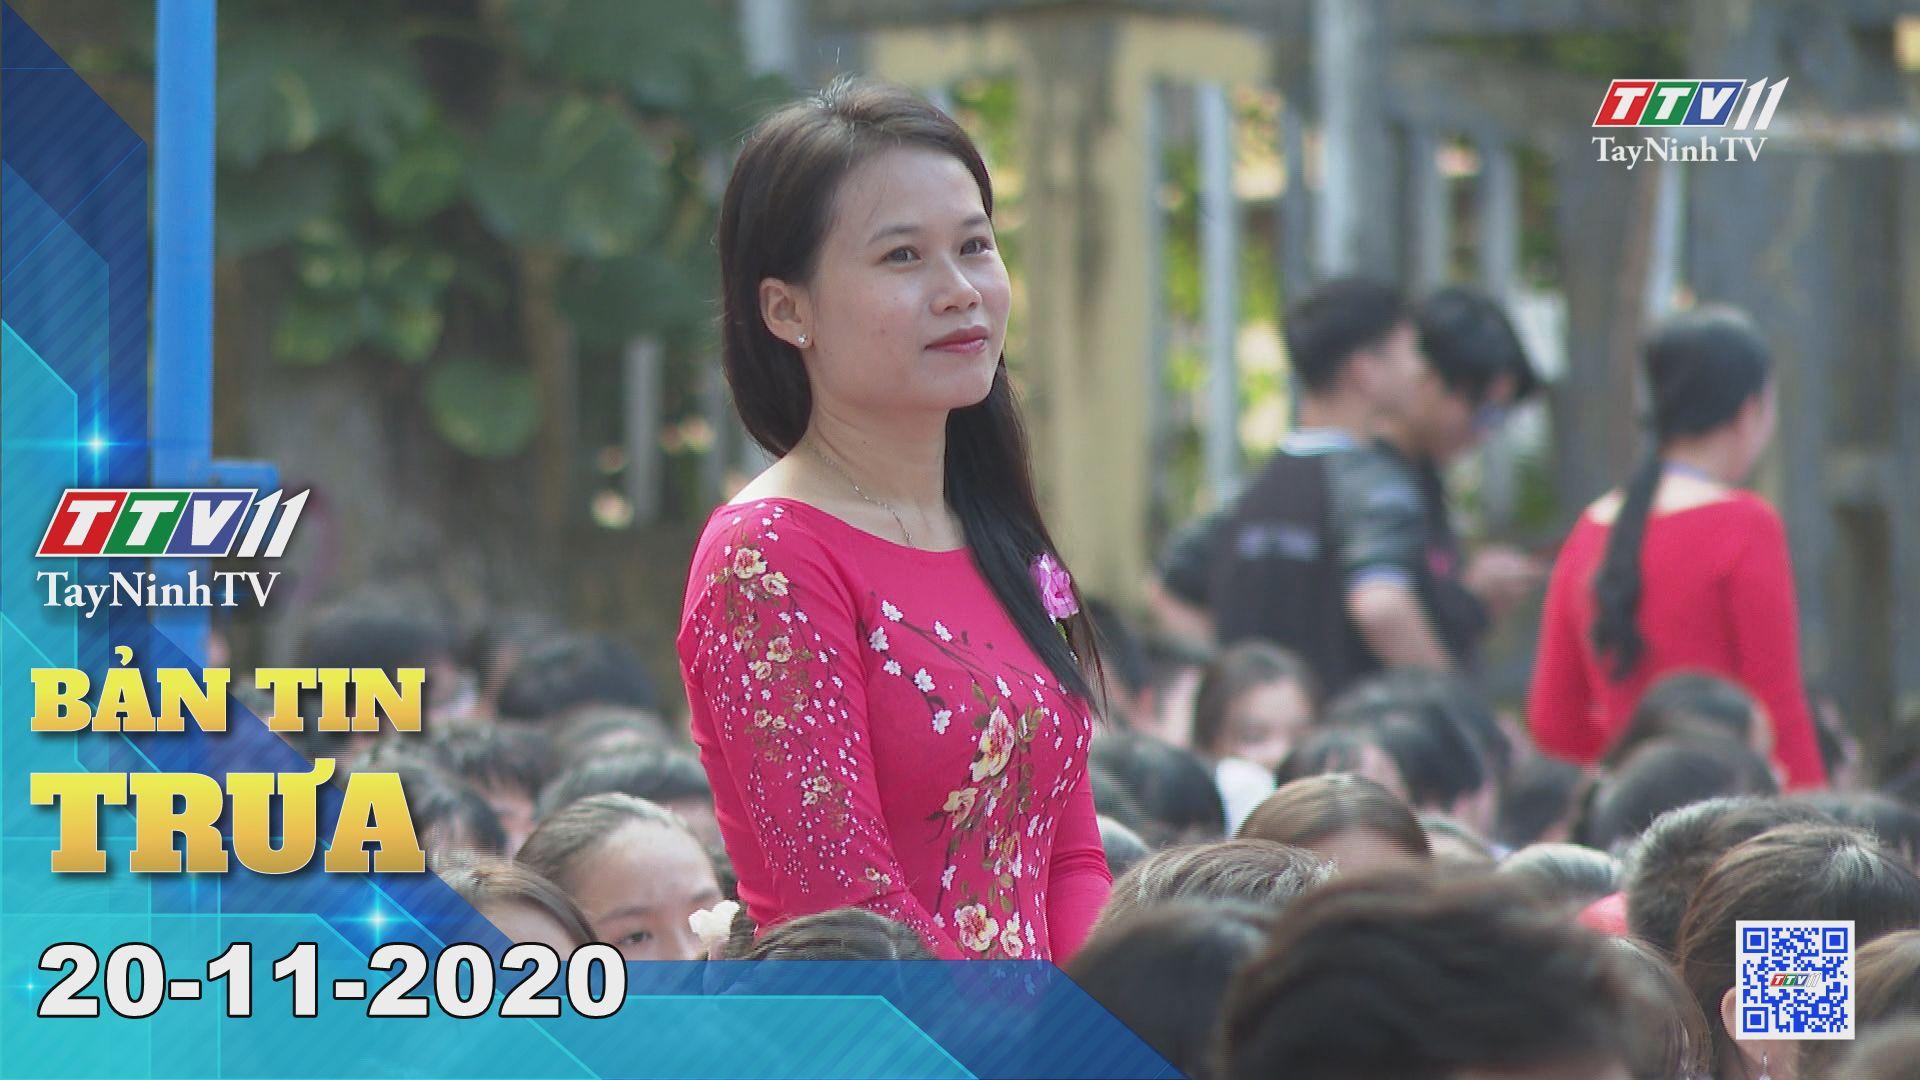 Bản tin trưa 20-11-2020 | Tin tức hôm nay | TayNinhTV